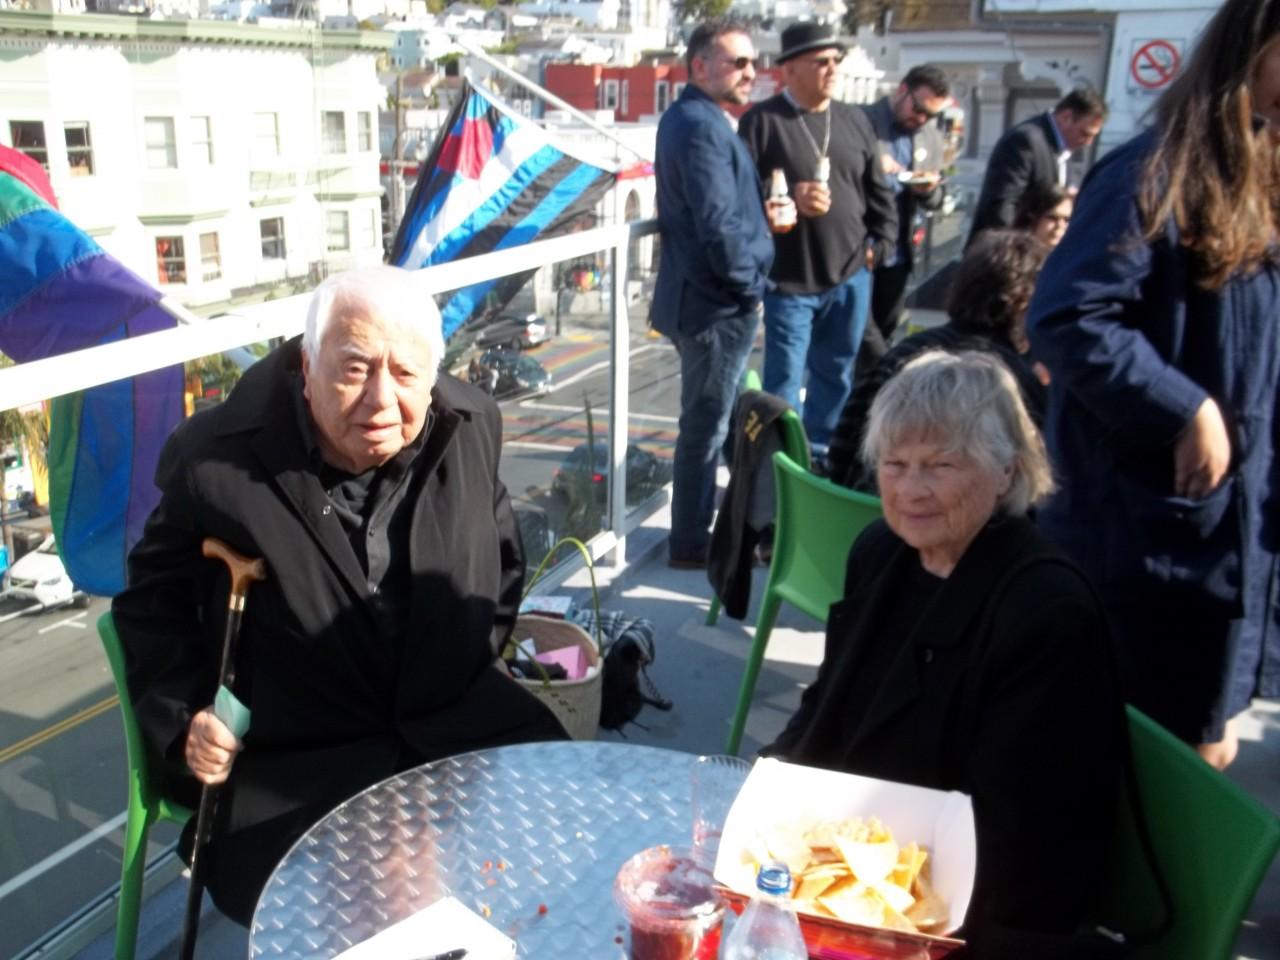 Hollister resident Tony Ruiz and his wife Kathy. Photo by Frank Perez.